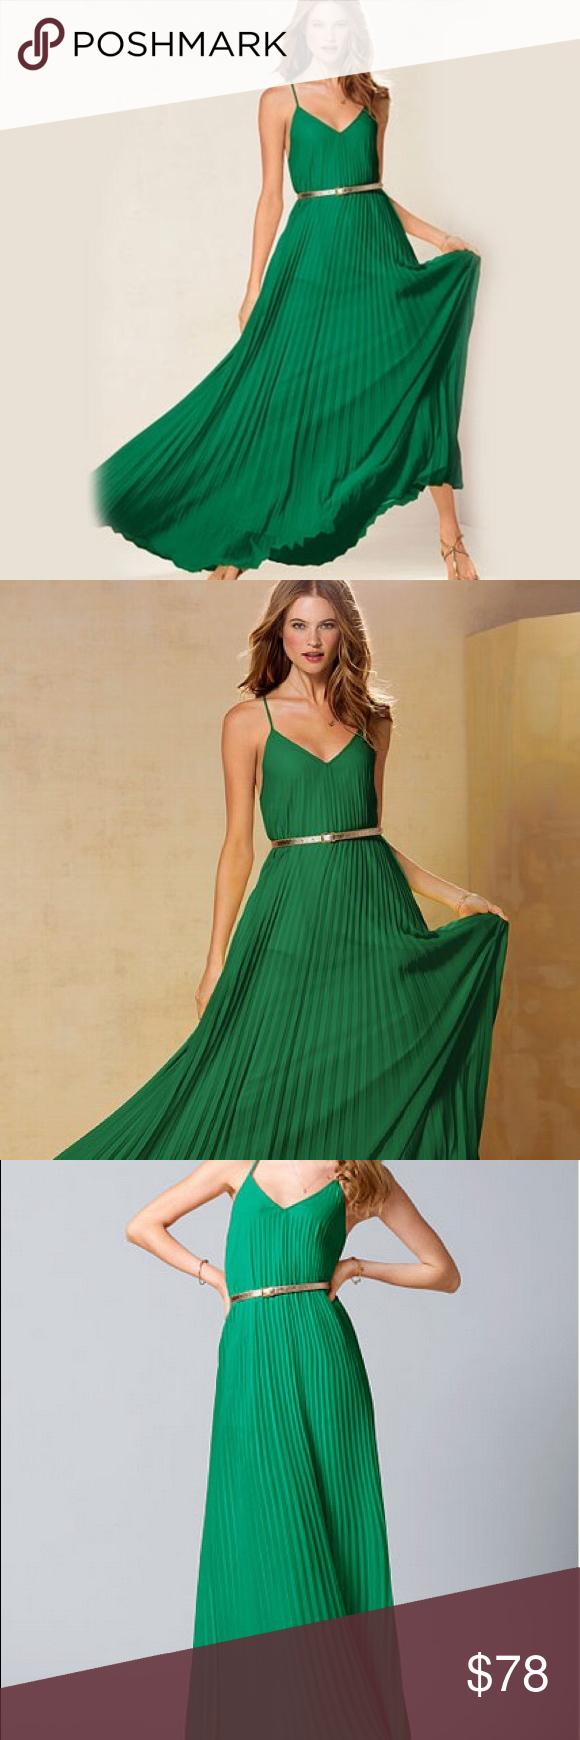 Nwot Victoria Secret Greed Pleated Maxi Pleated Maxi Victoria Secret Fashion [ 1740 x 580 Pixel ]